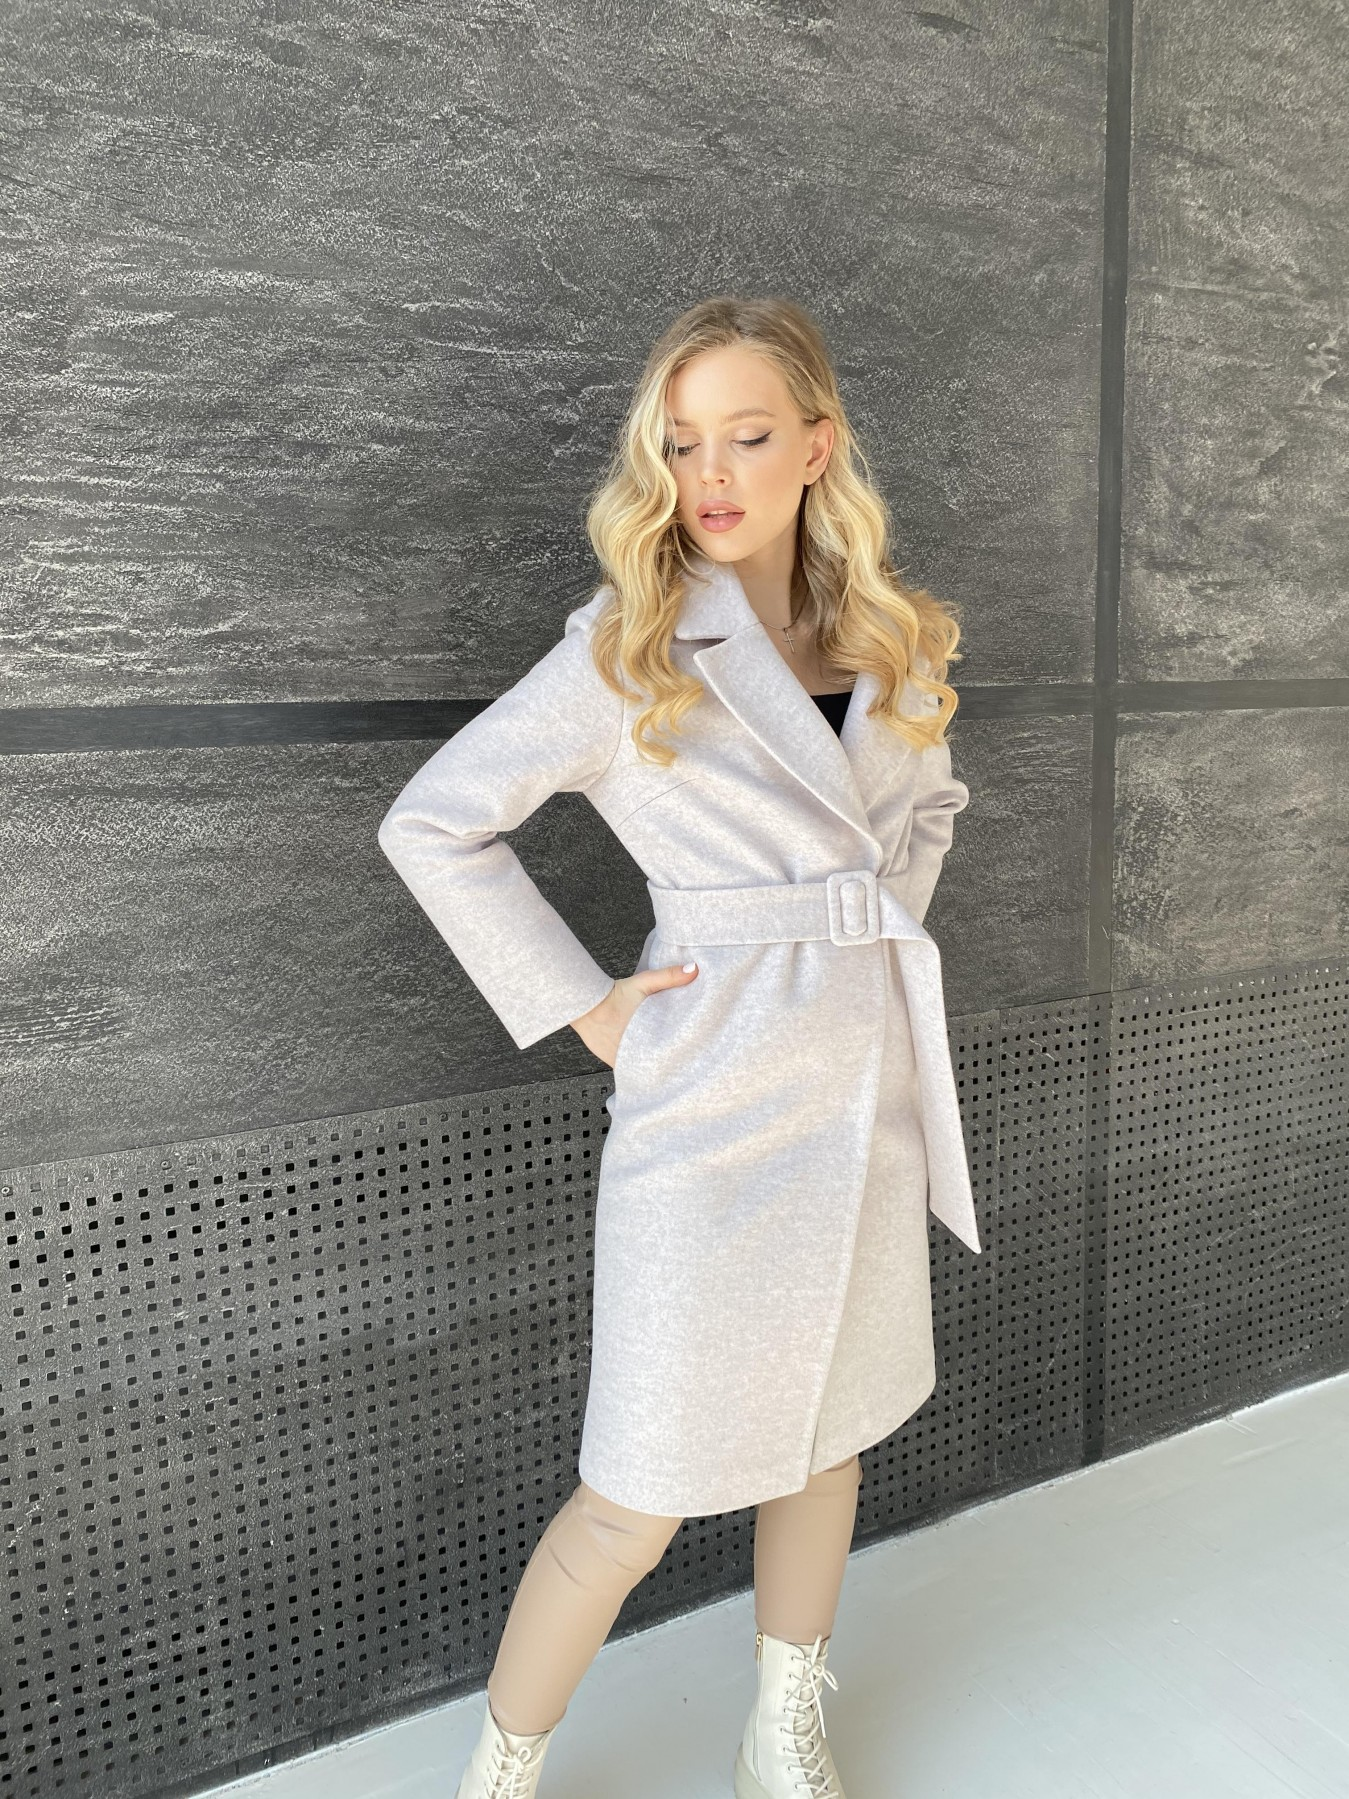 Севен пальто меланж  из кашемира 10625 АРТ. 47160 Цвет: Бежевый меланж - фото 5, интернет магазин tm-modus.ru